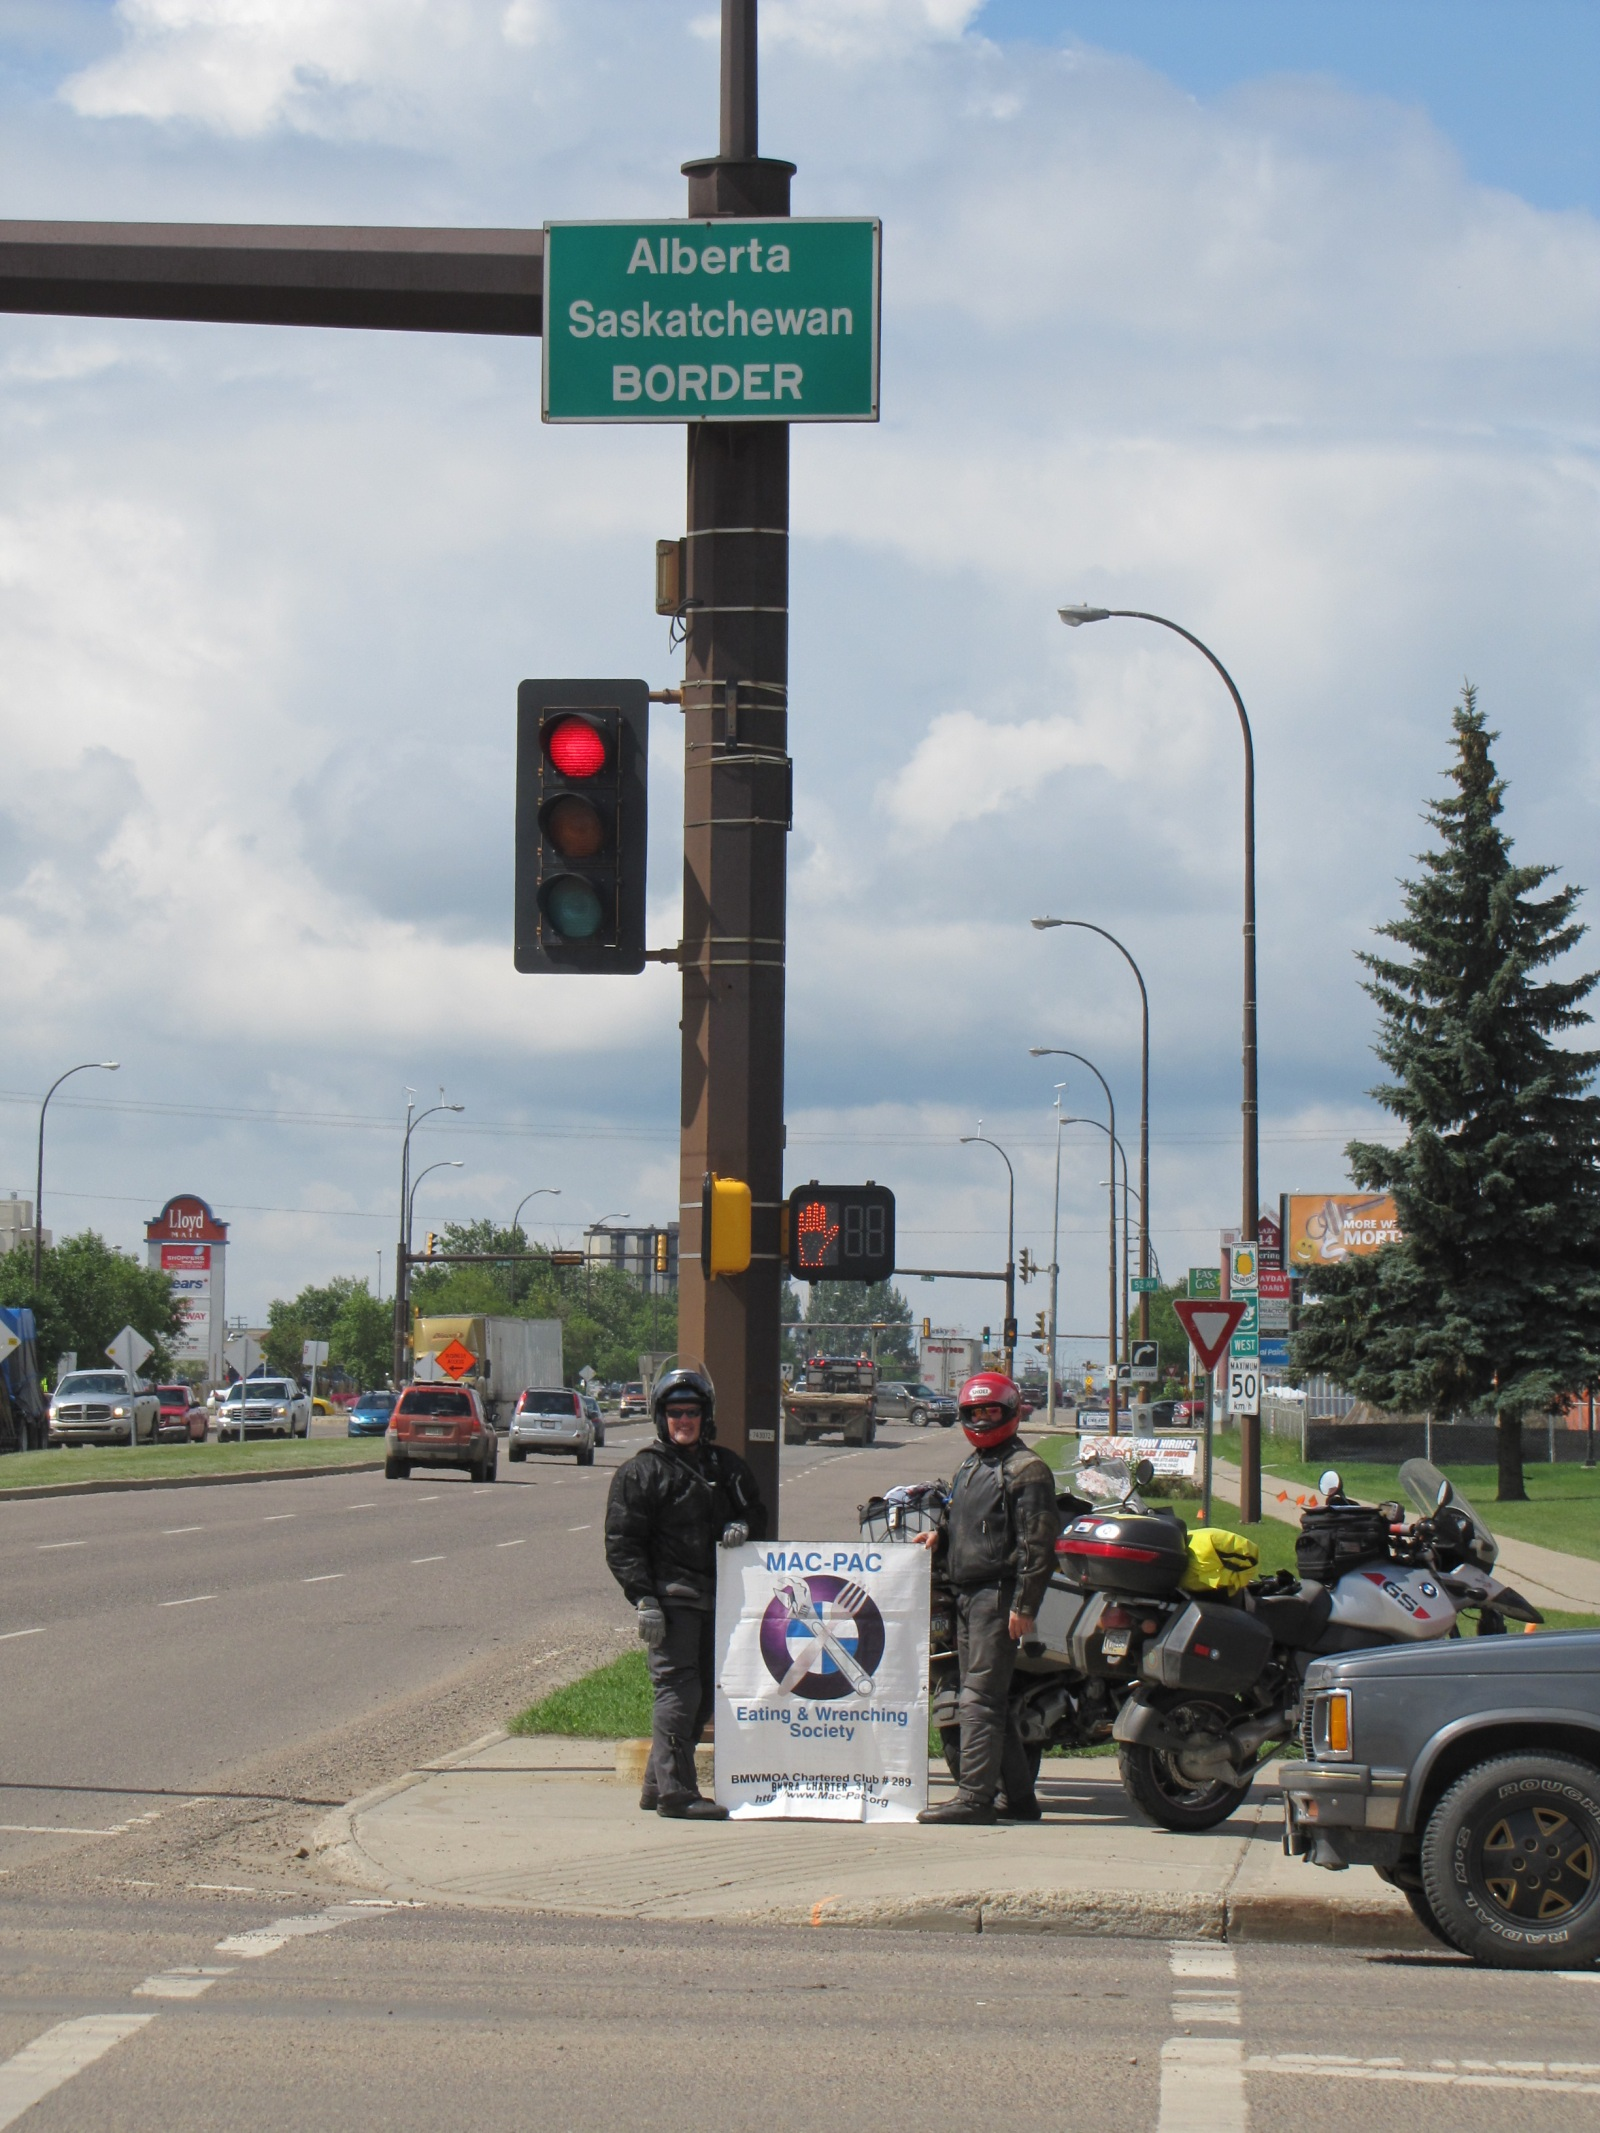 Alberta - Saskatchewan Border